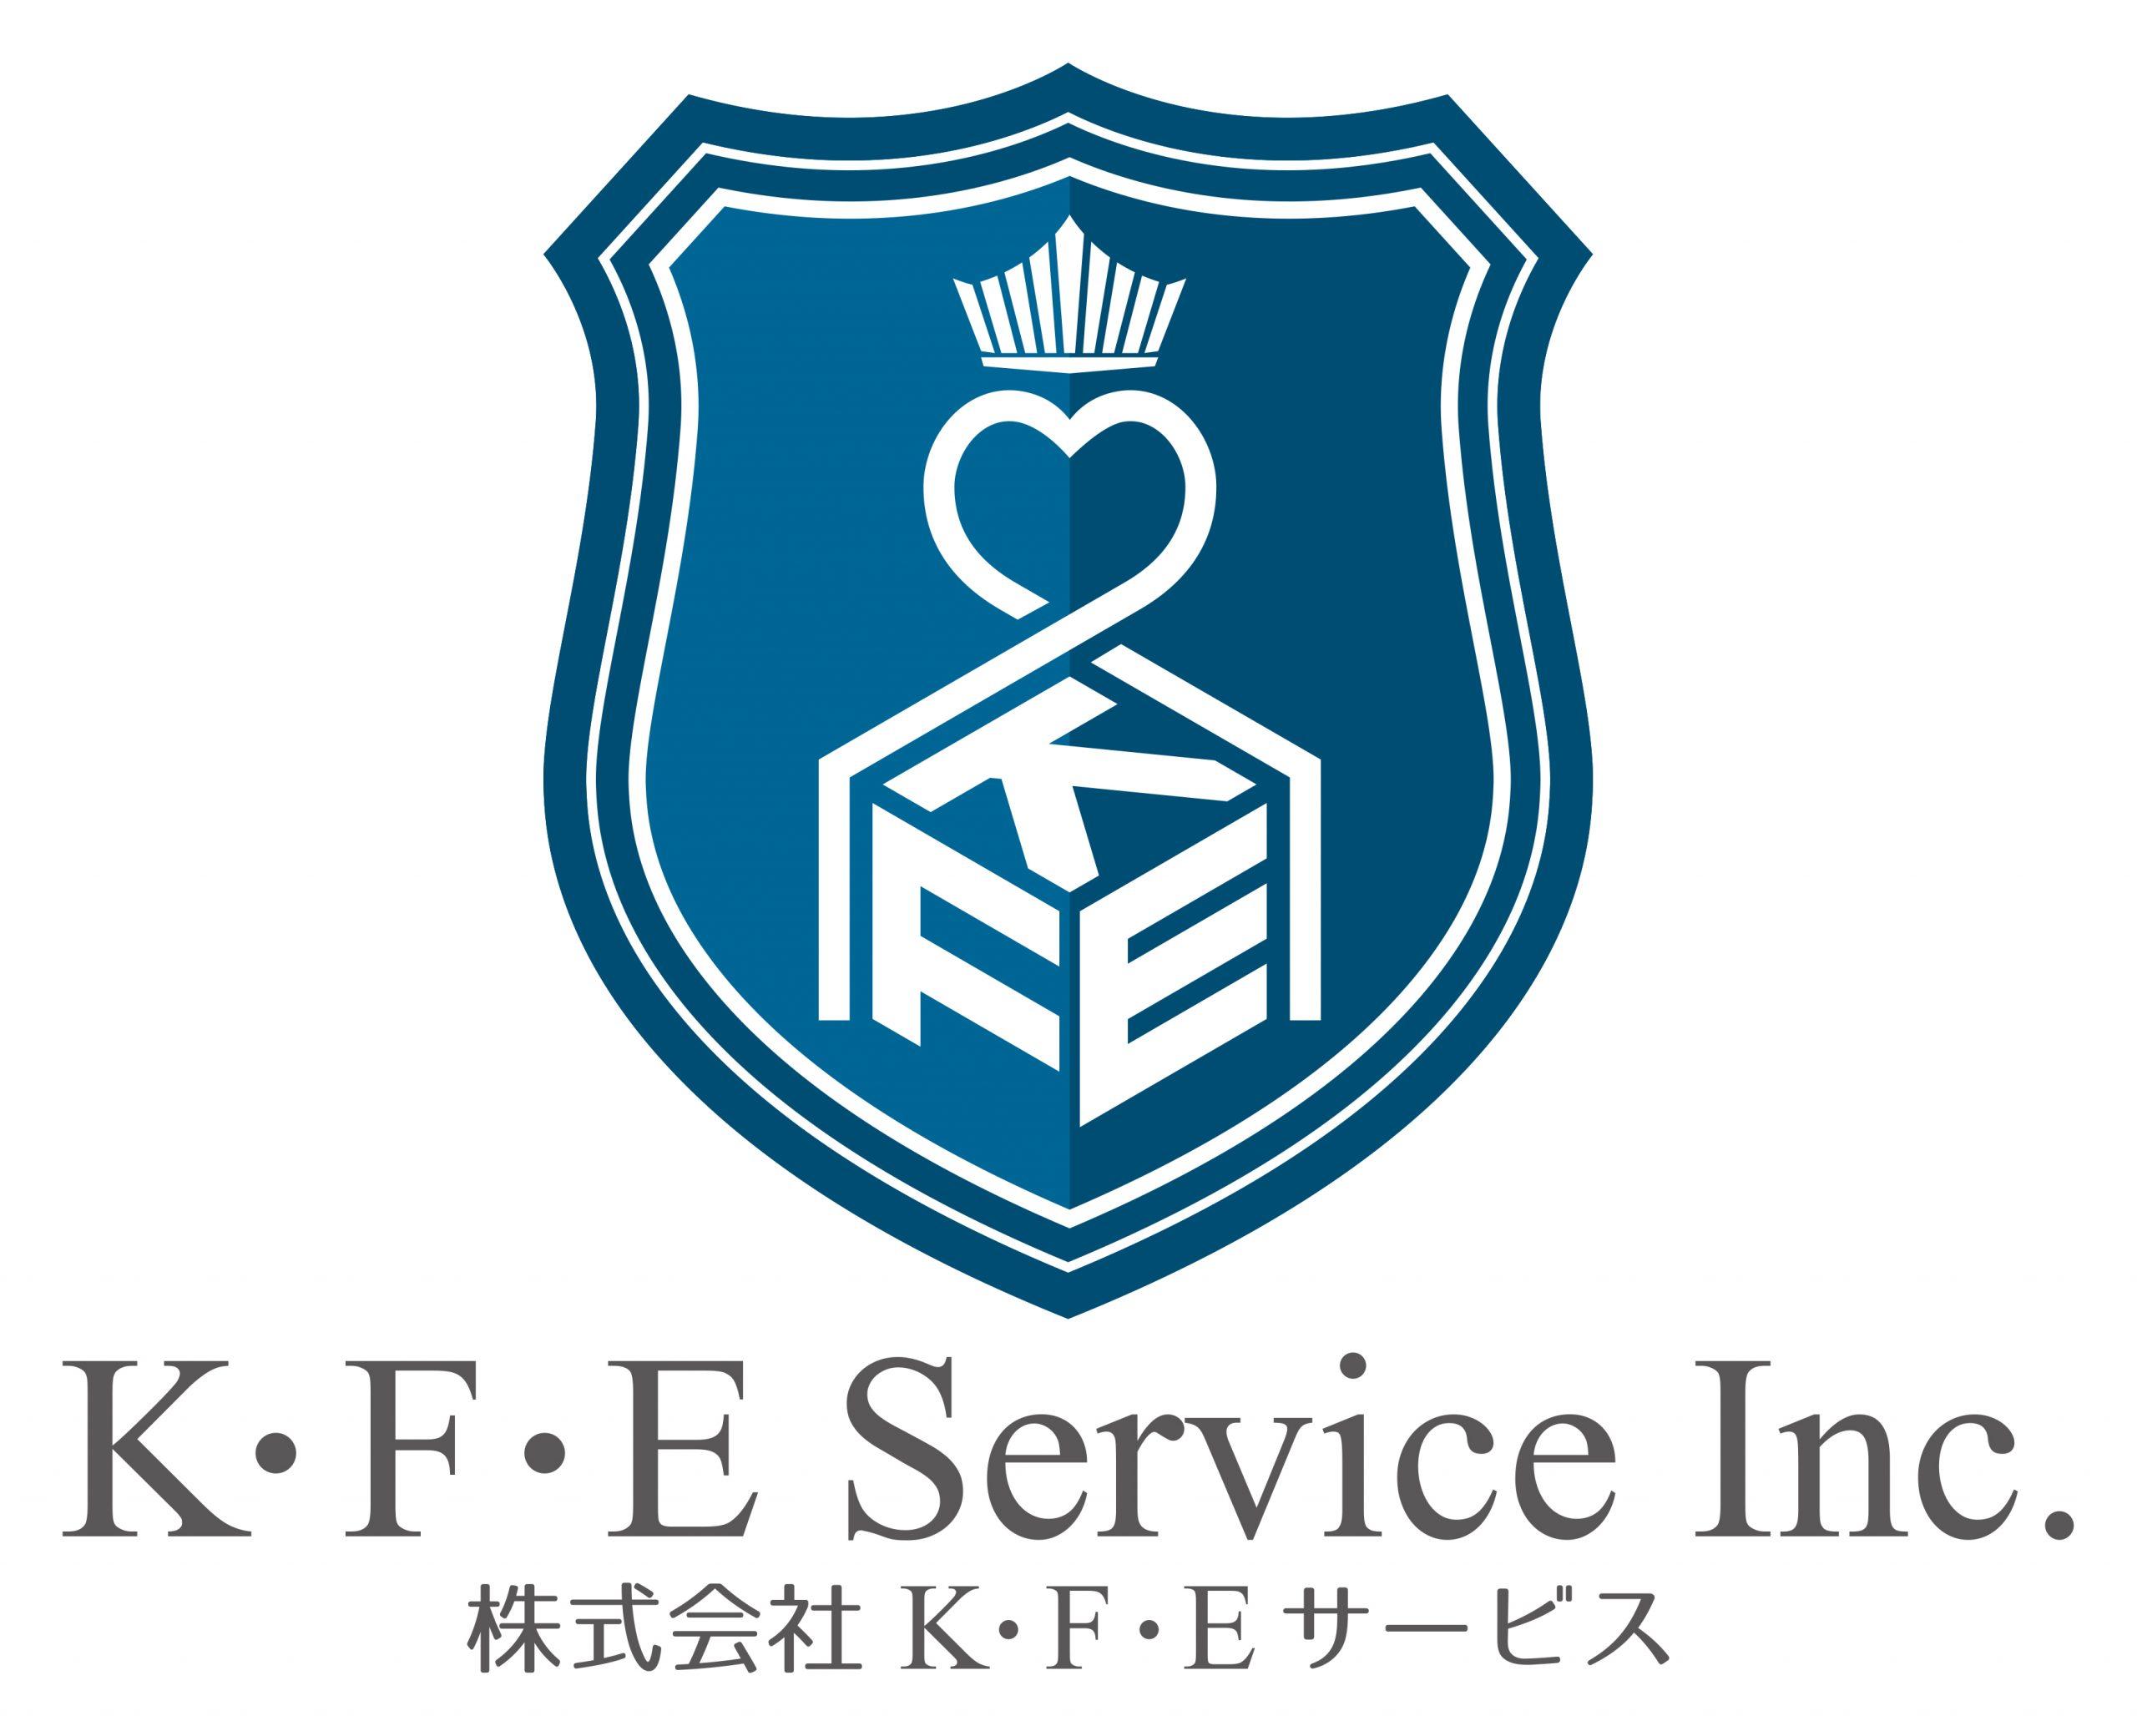 KFE.service.inc